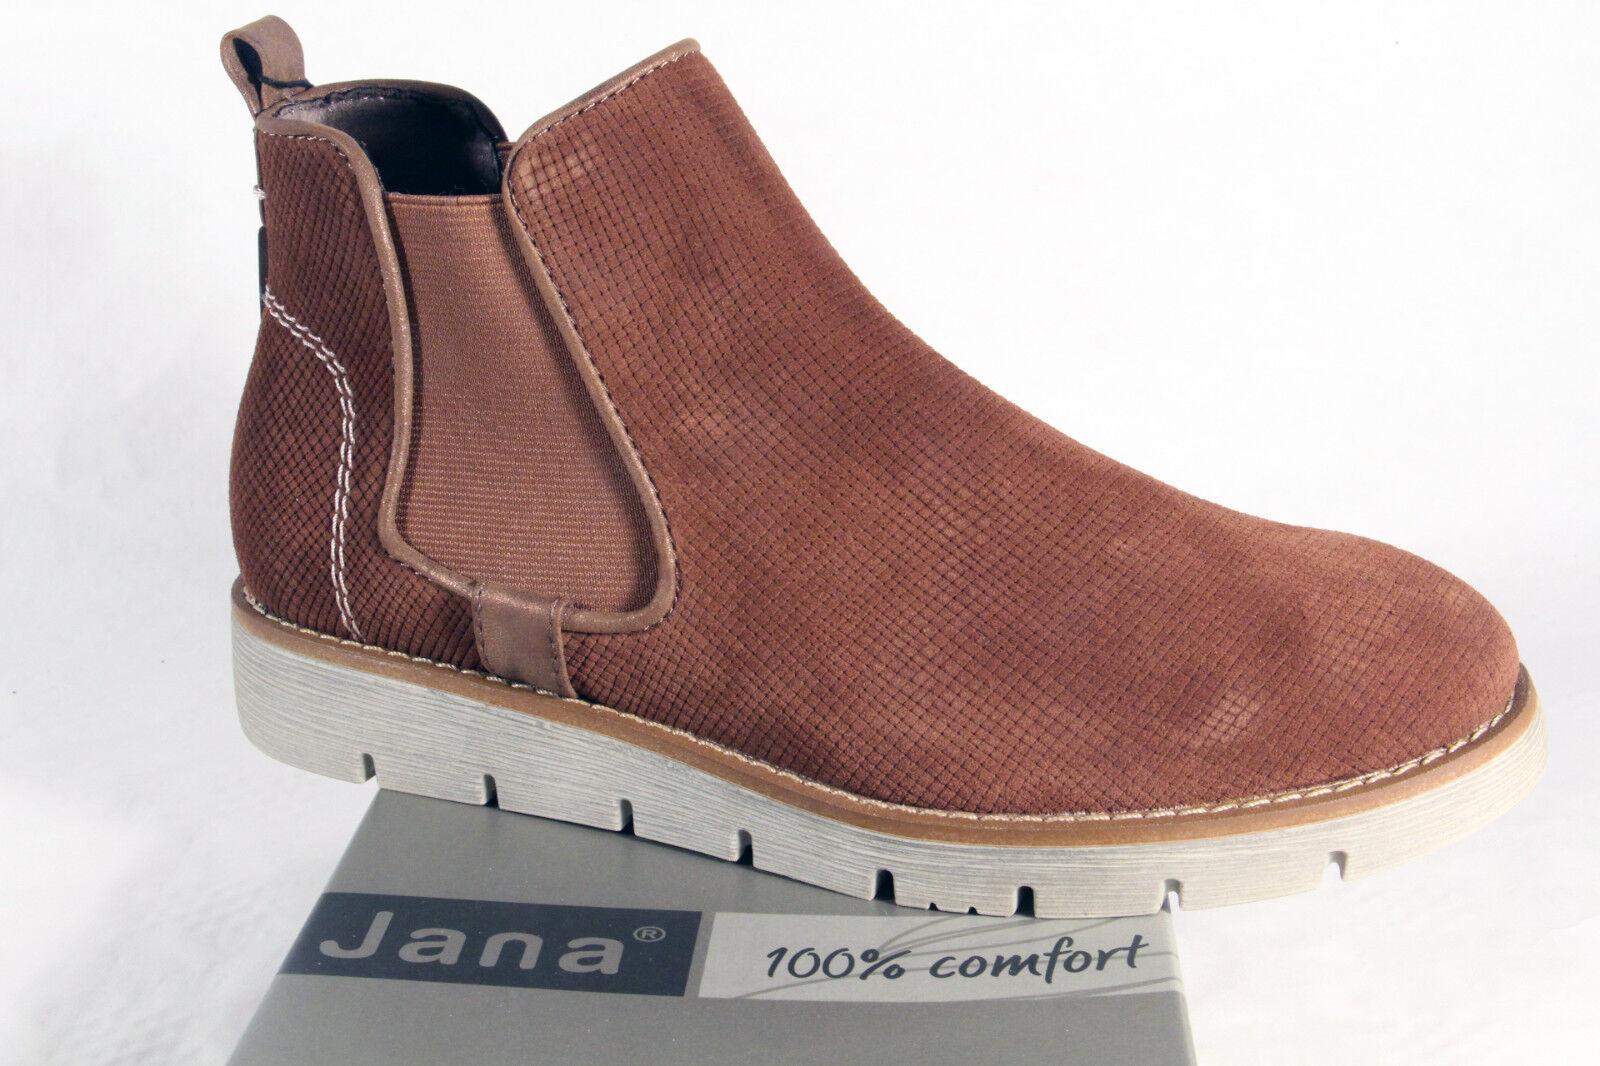 outlet store 19449 47301 Jana Stiefelette, Stiefel, Slipper, Boots Echtleder braun 25409 NEU